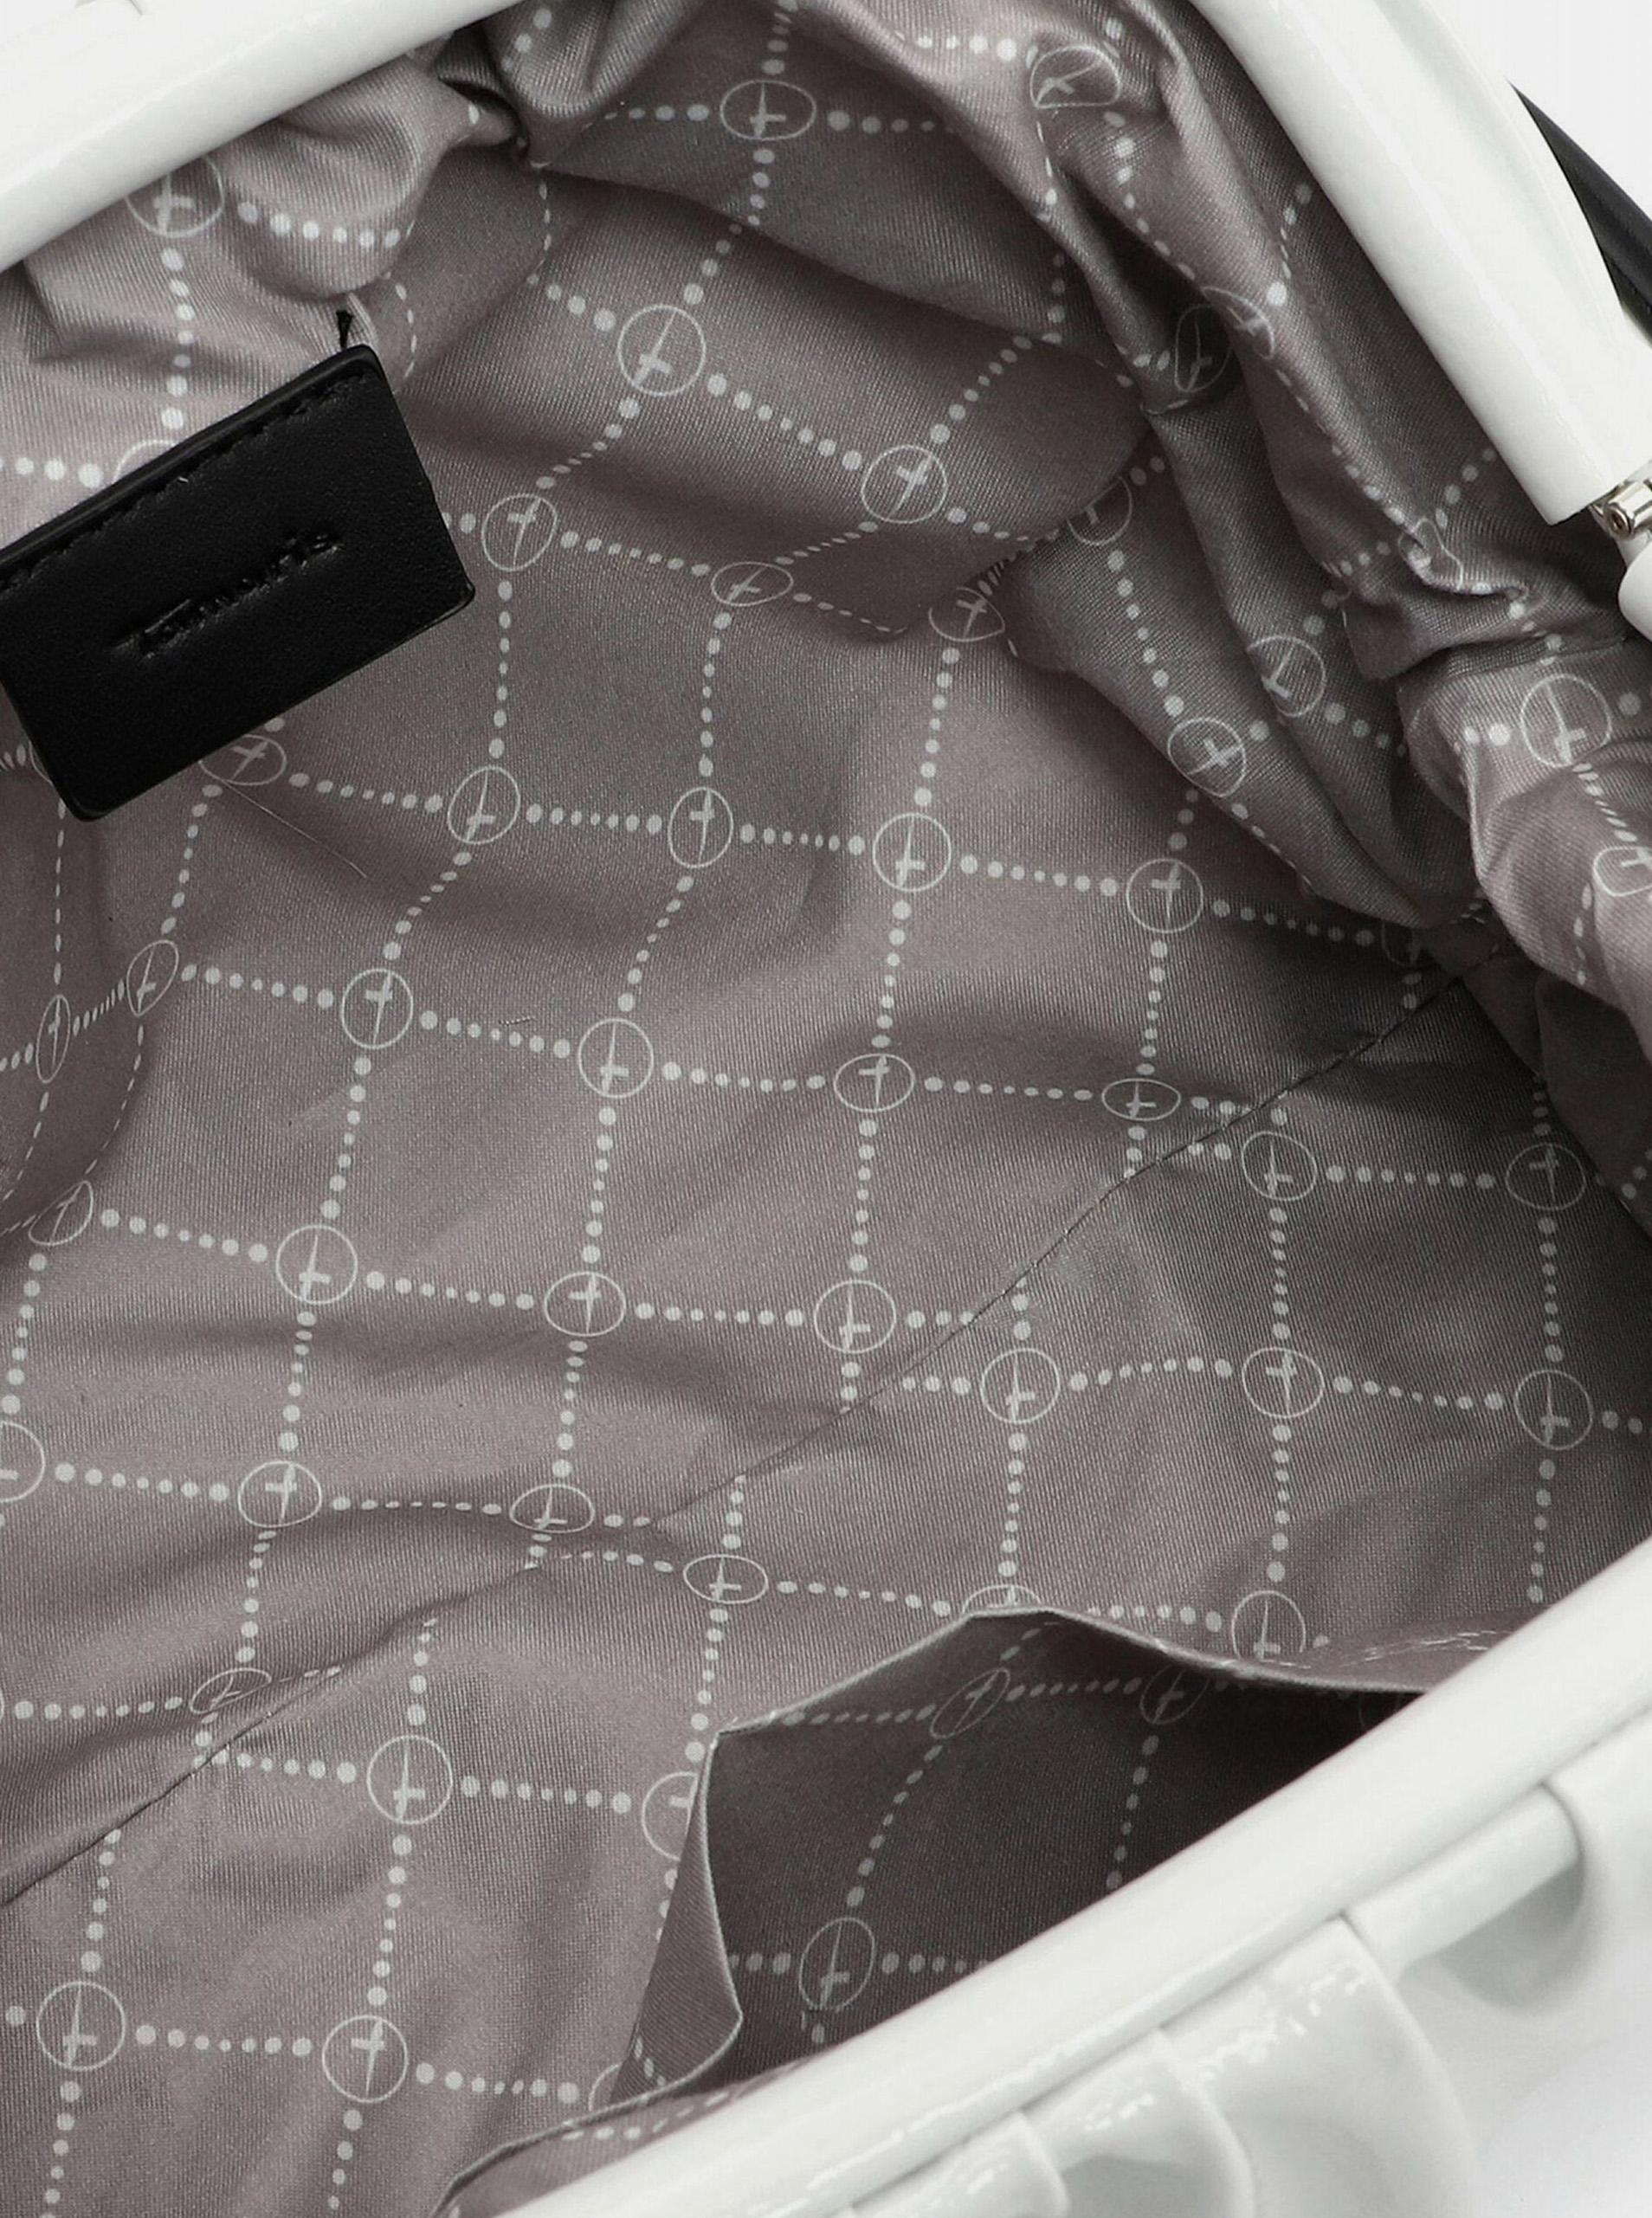 Tamaris white small crossbody handbag